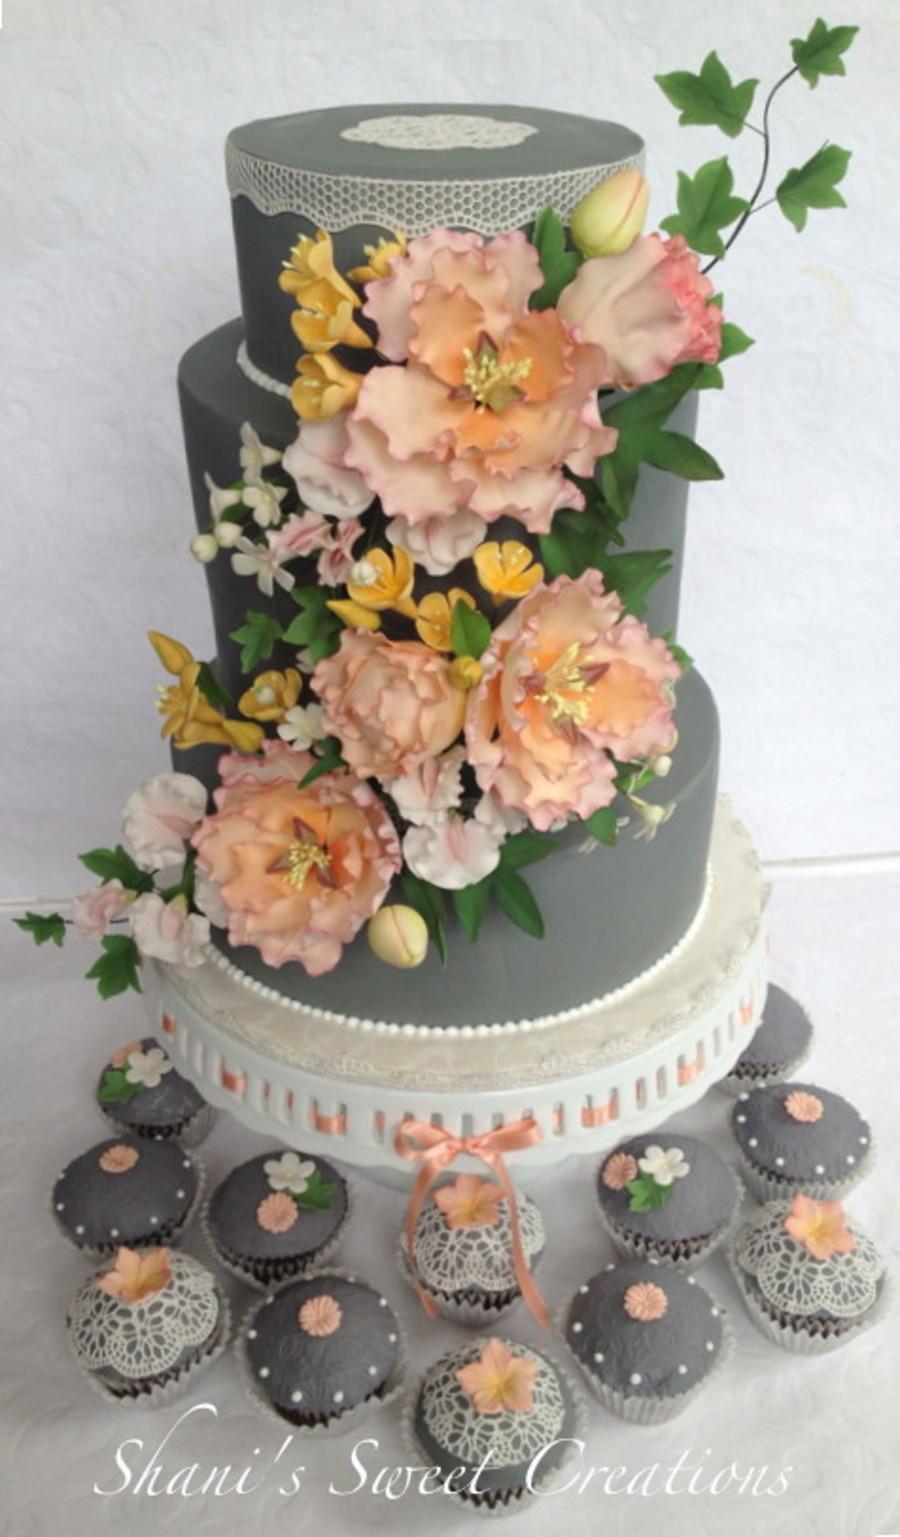 Sugar Flowers Wedding Cakes  Wedding Cake And Matching Cupcakes With Sugar Flowers And